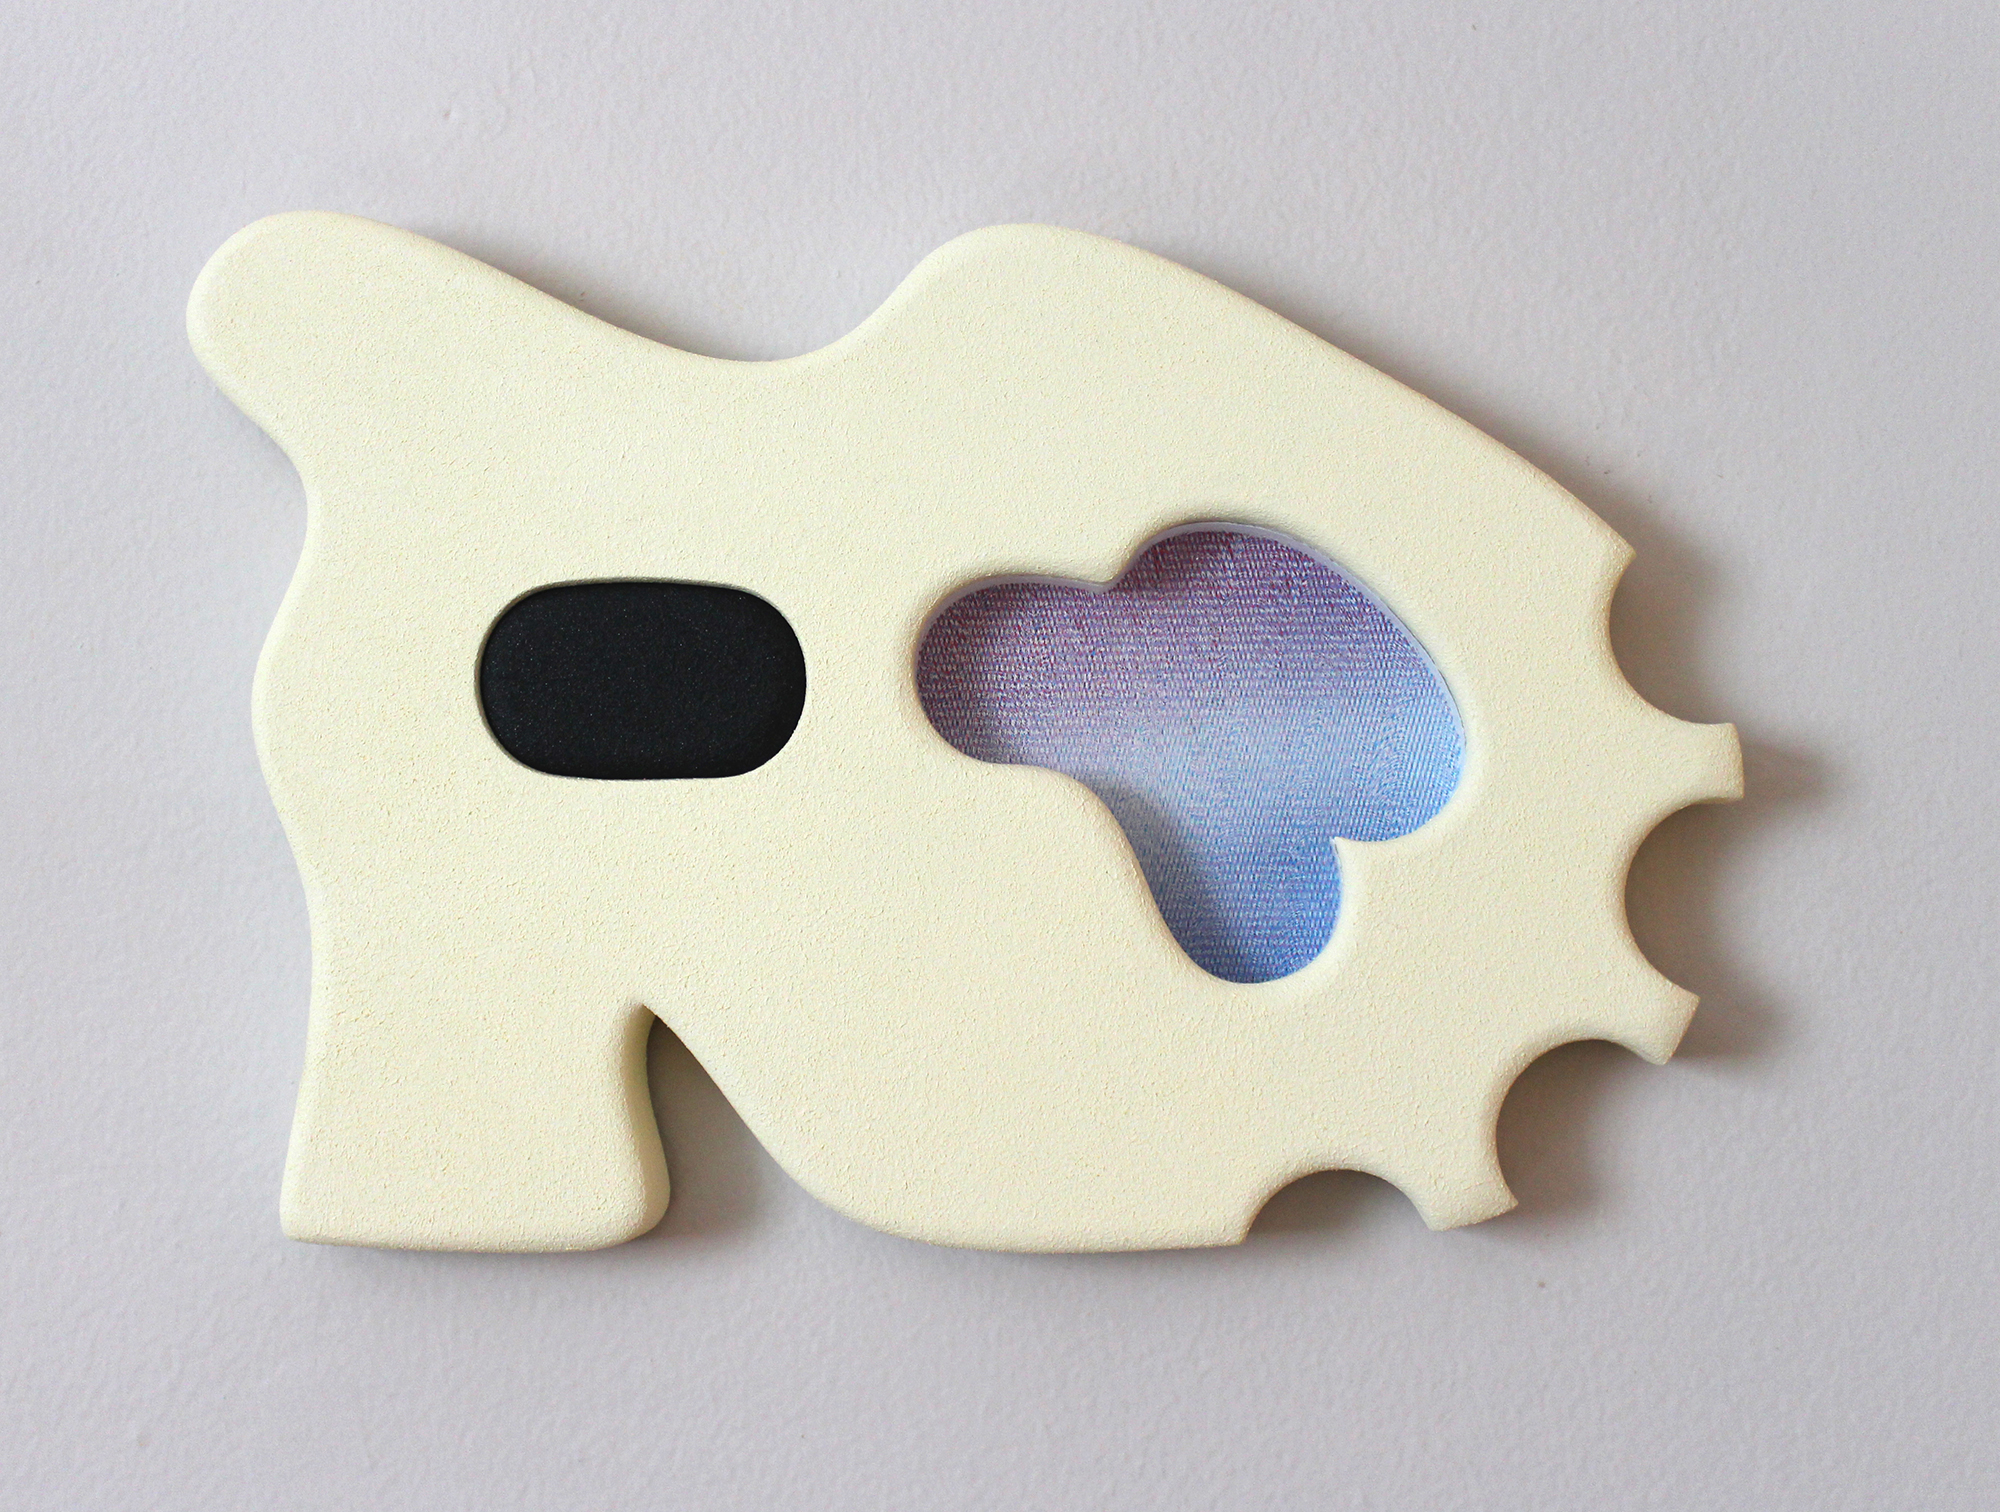 Acrylic, MDF, Plexiglass and Screenprint, 14 3/4 X 10 Inches